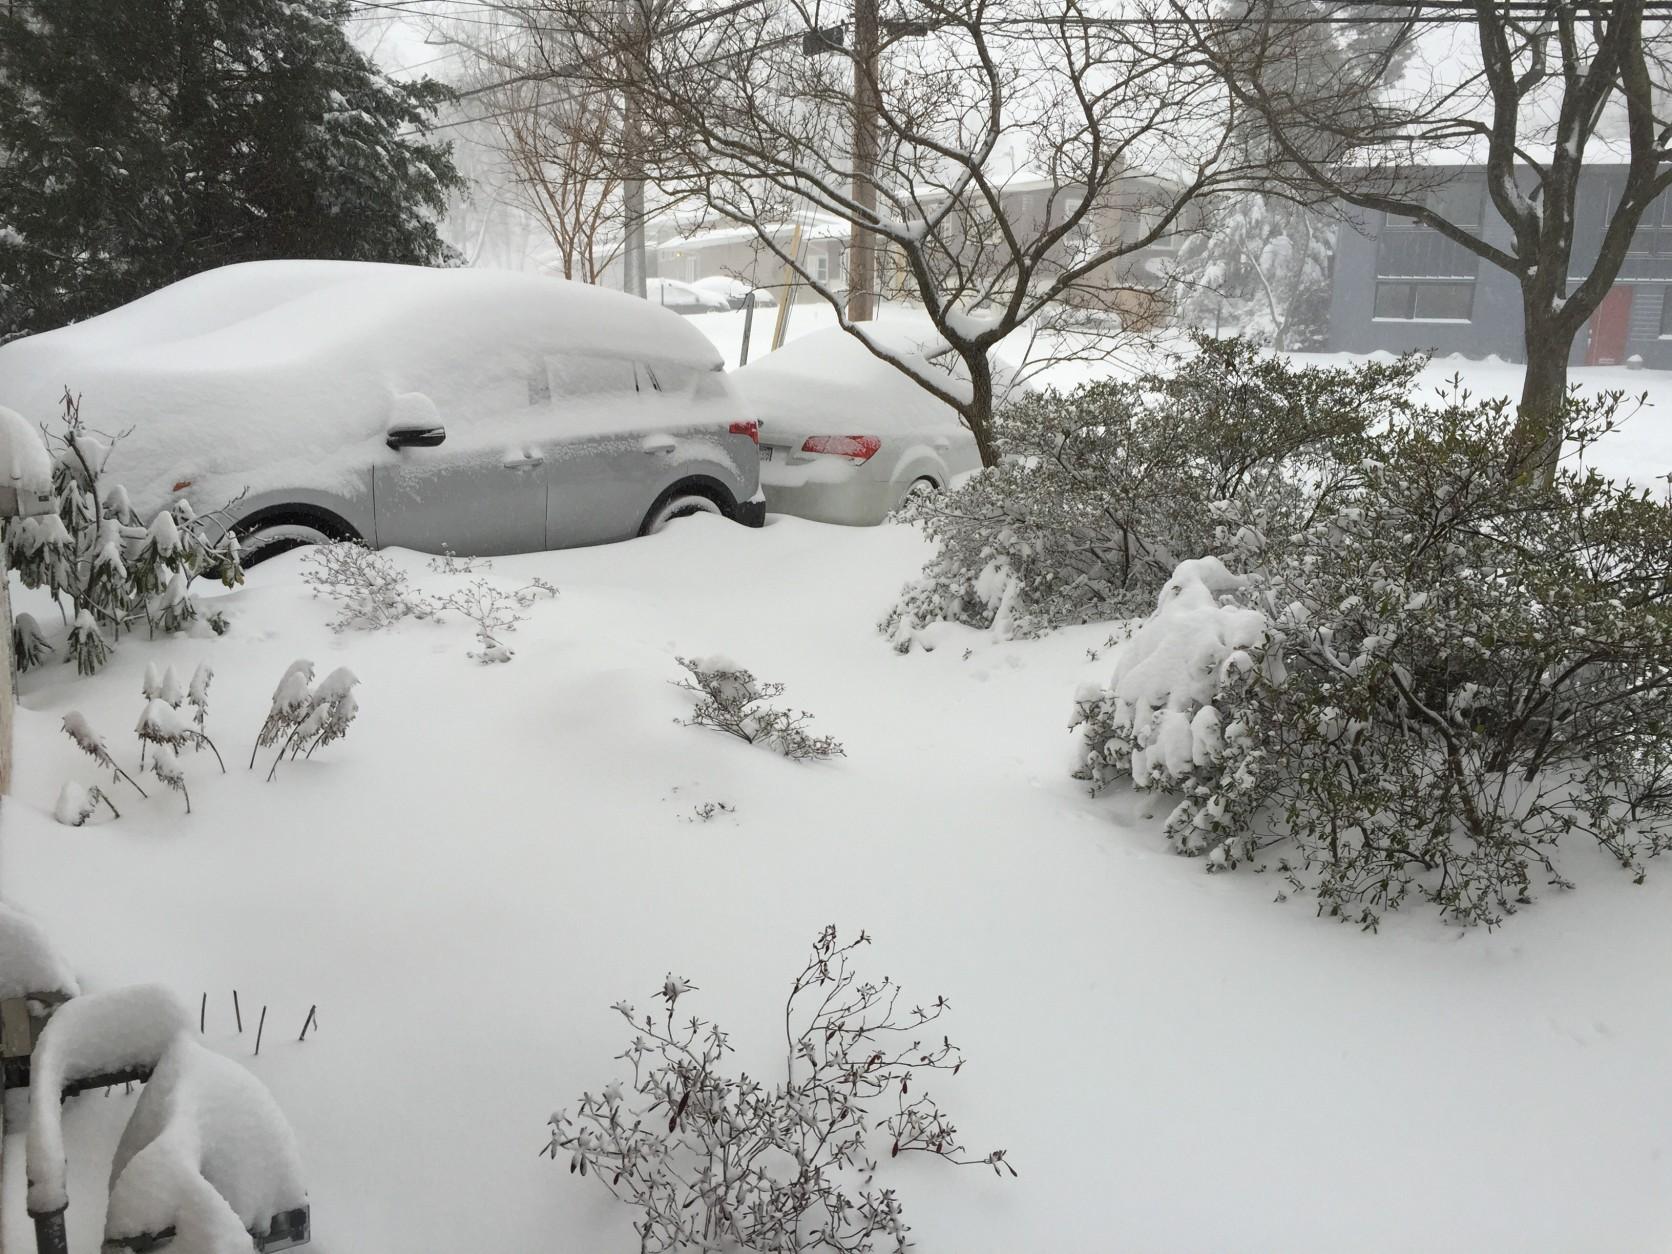 Buried minivan-Kensington, MD. (Courtesy WTOP listener)